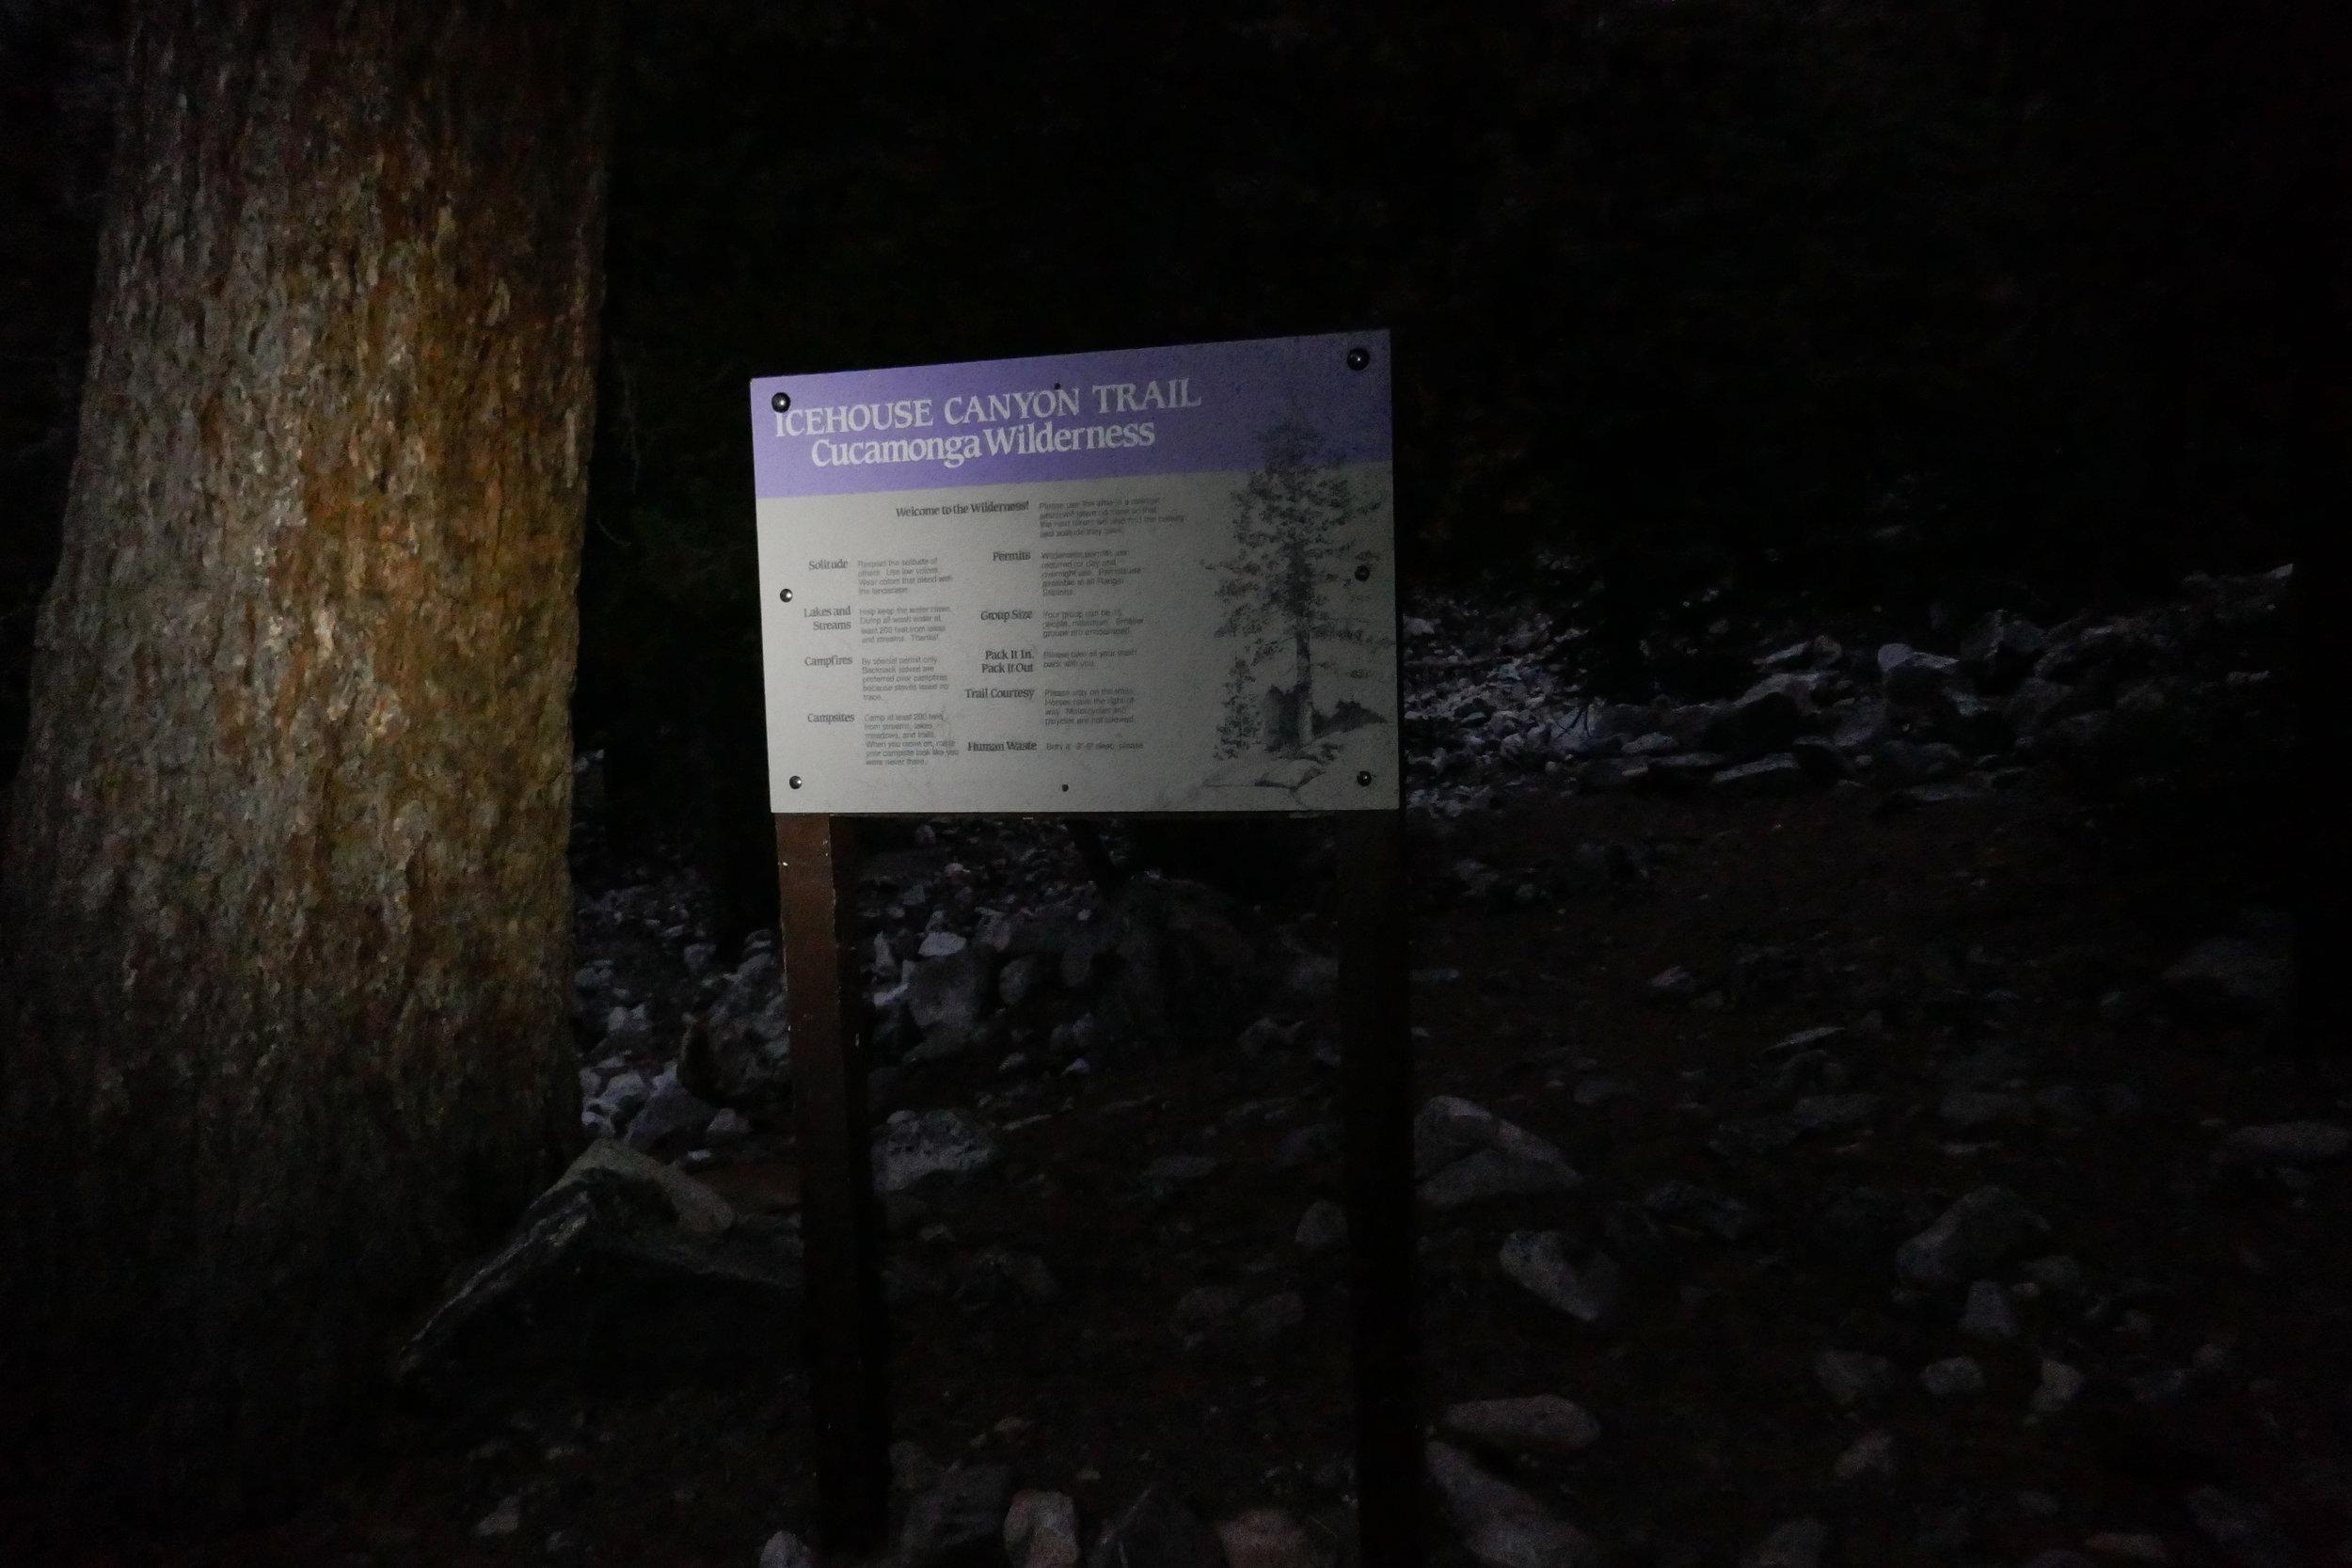 It was still dark when we reached Cucamonga Wilderness.